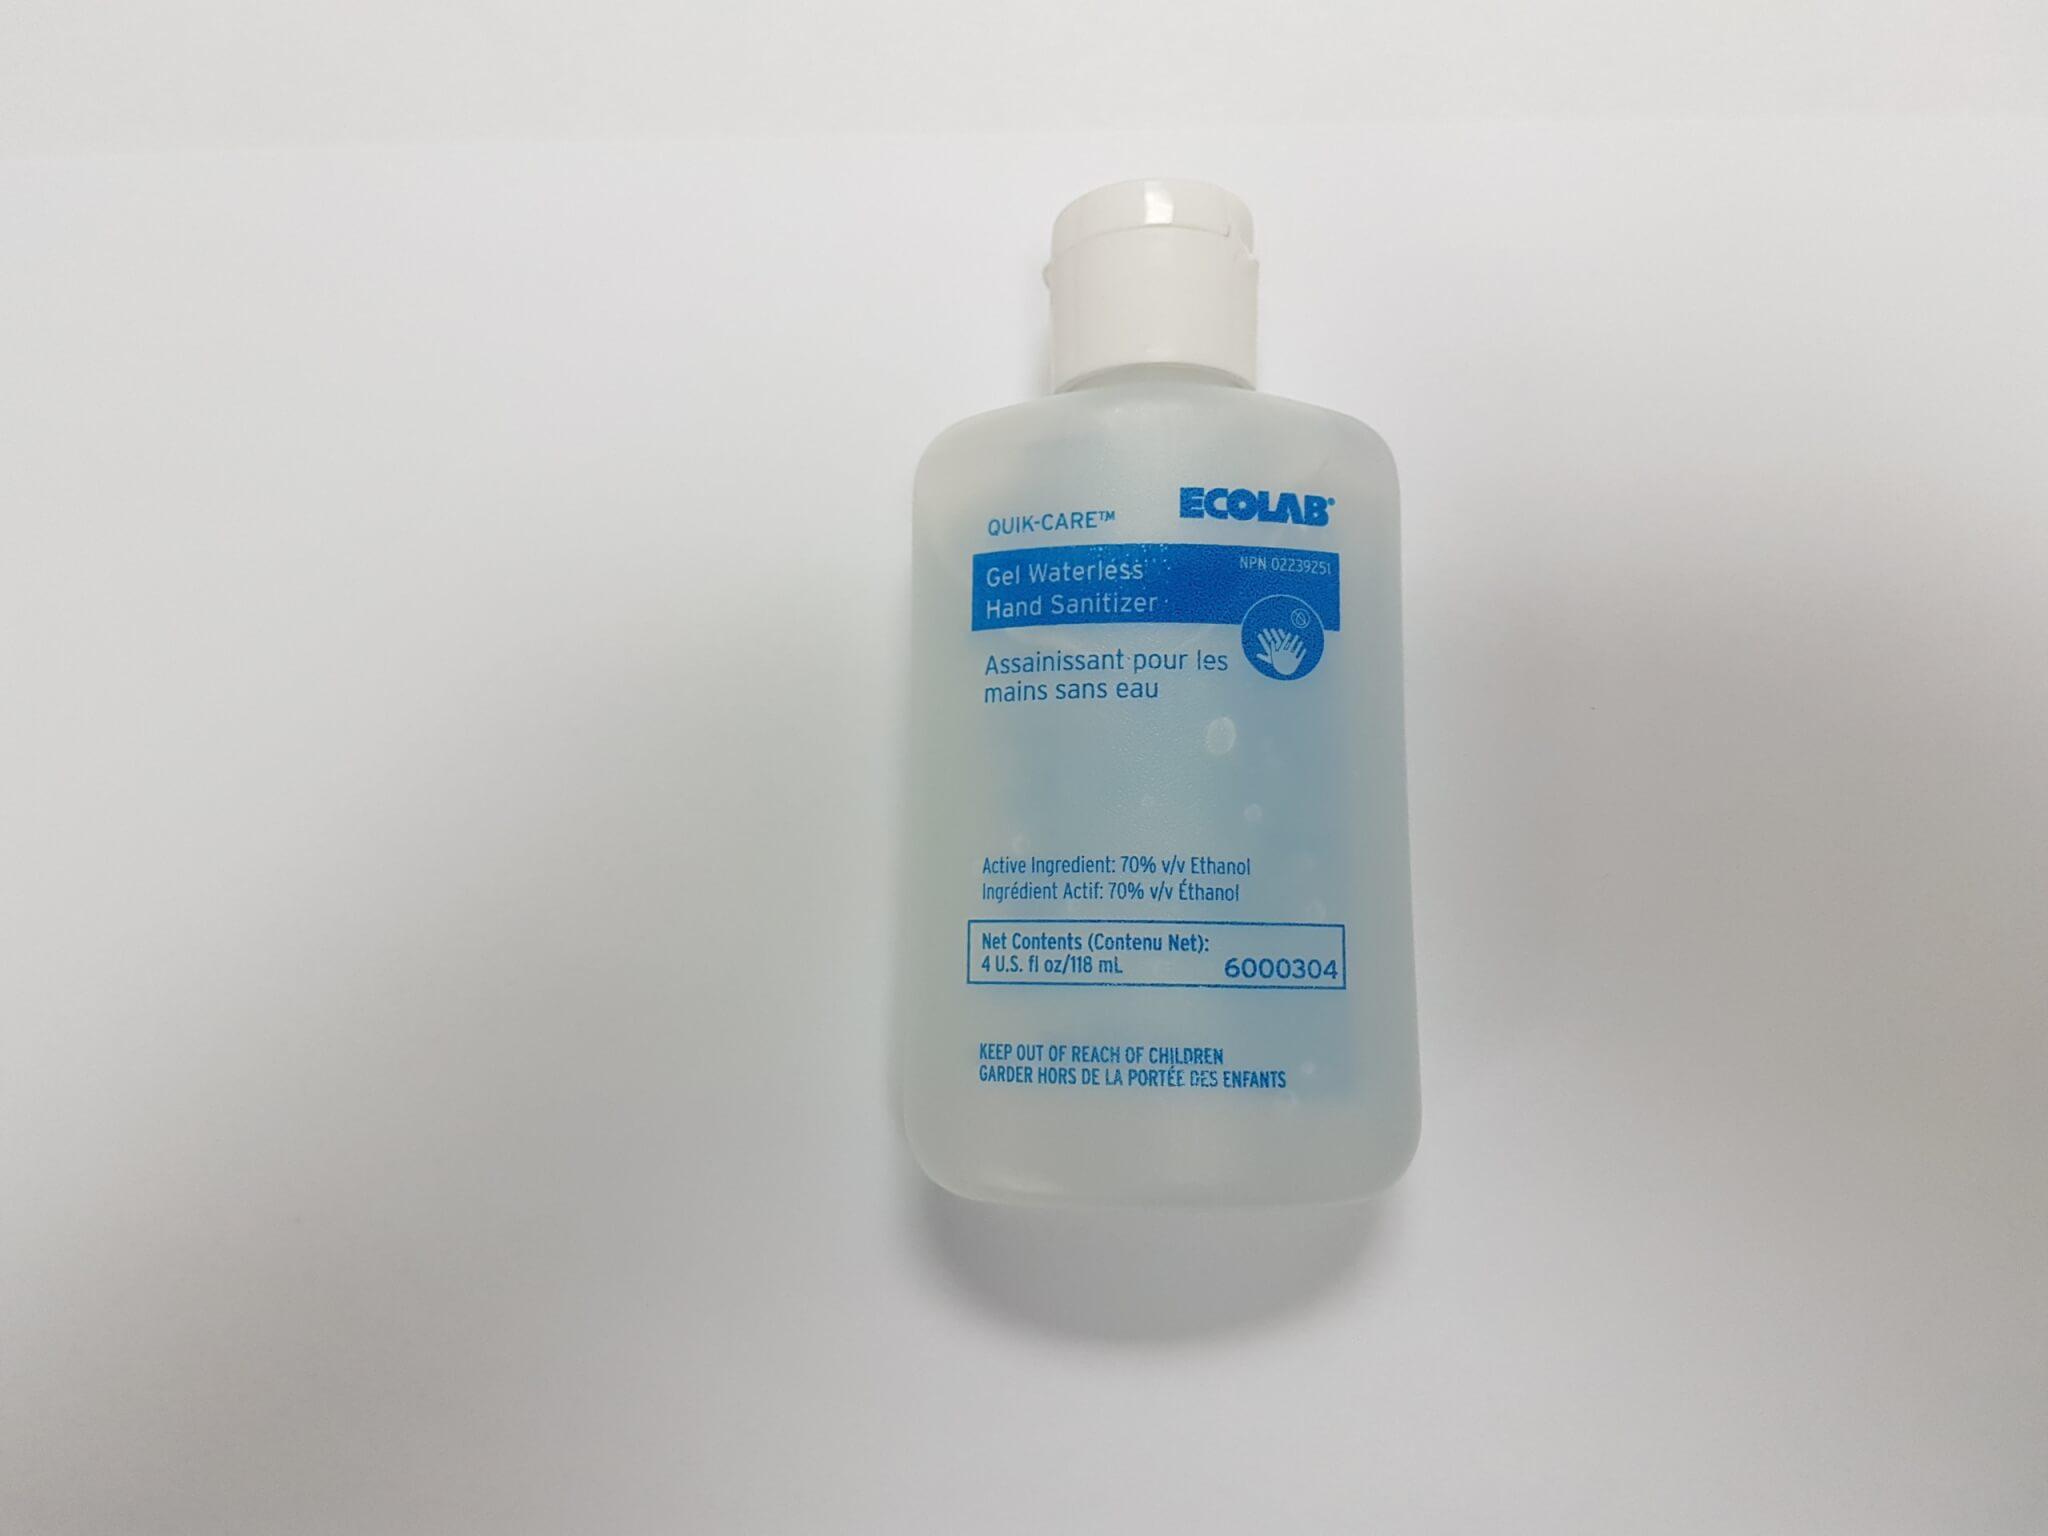 EcoLab Quik-Care Hand Sanitizer